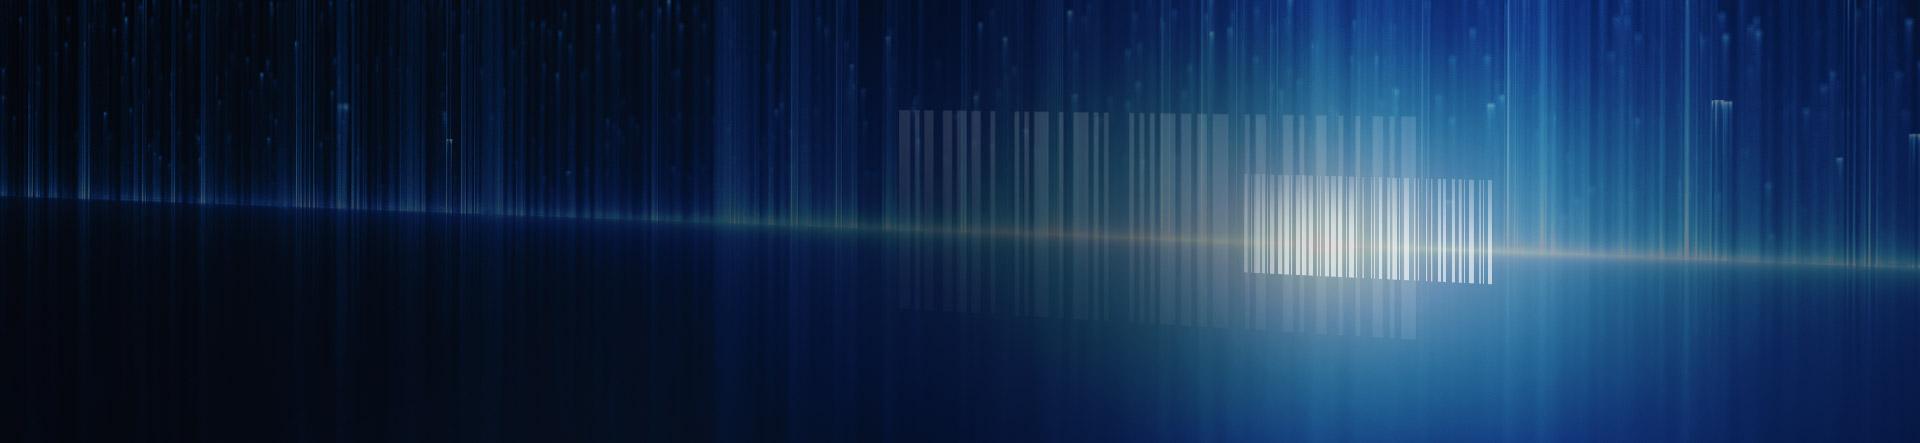 1DMax Banner